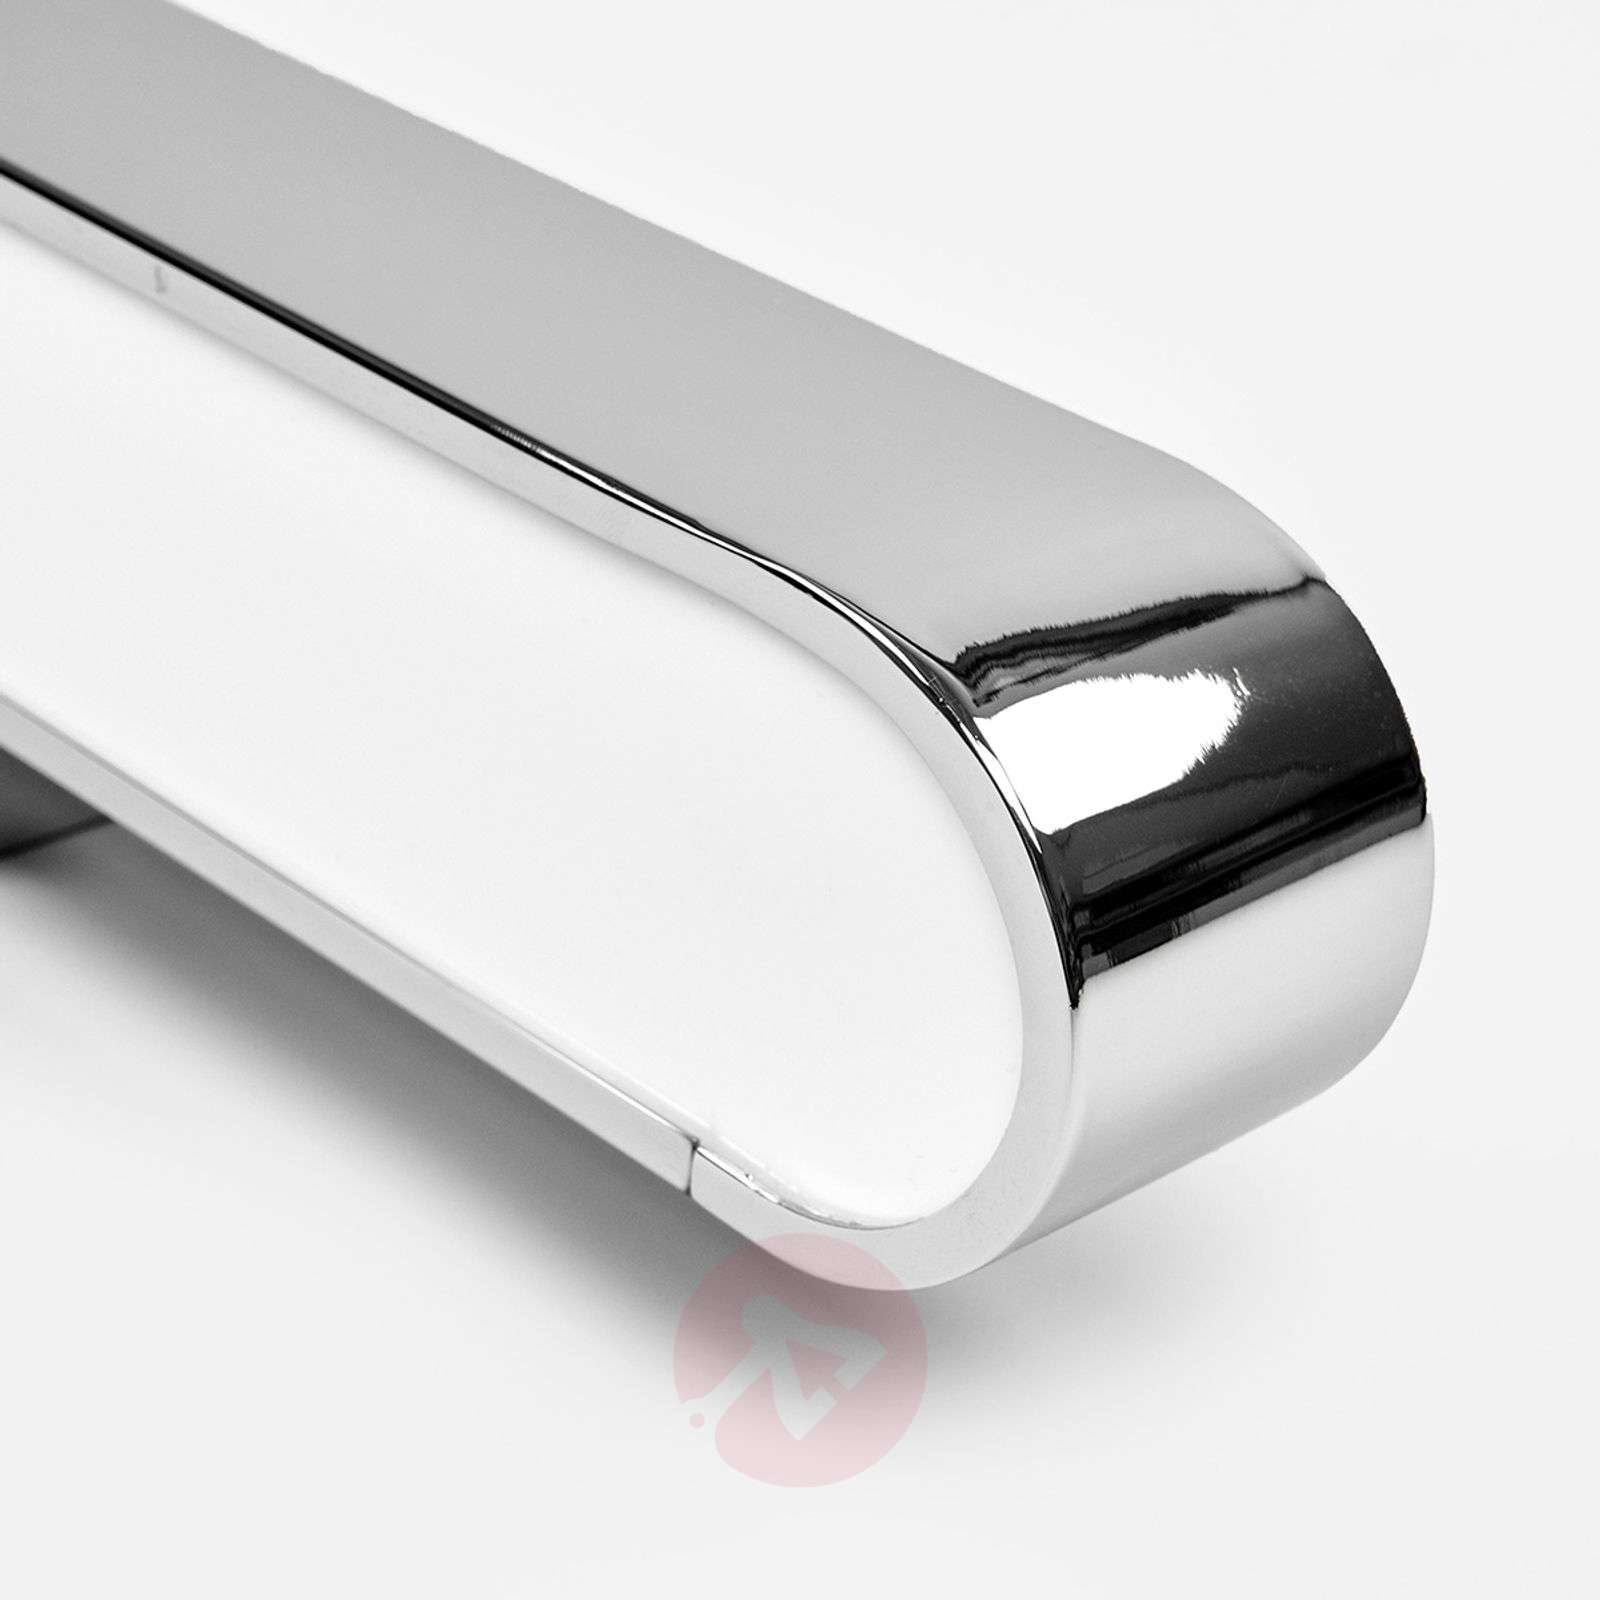 Neven LED Wall Light Chrome Wide-9641009-01